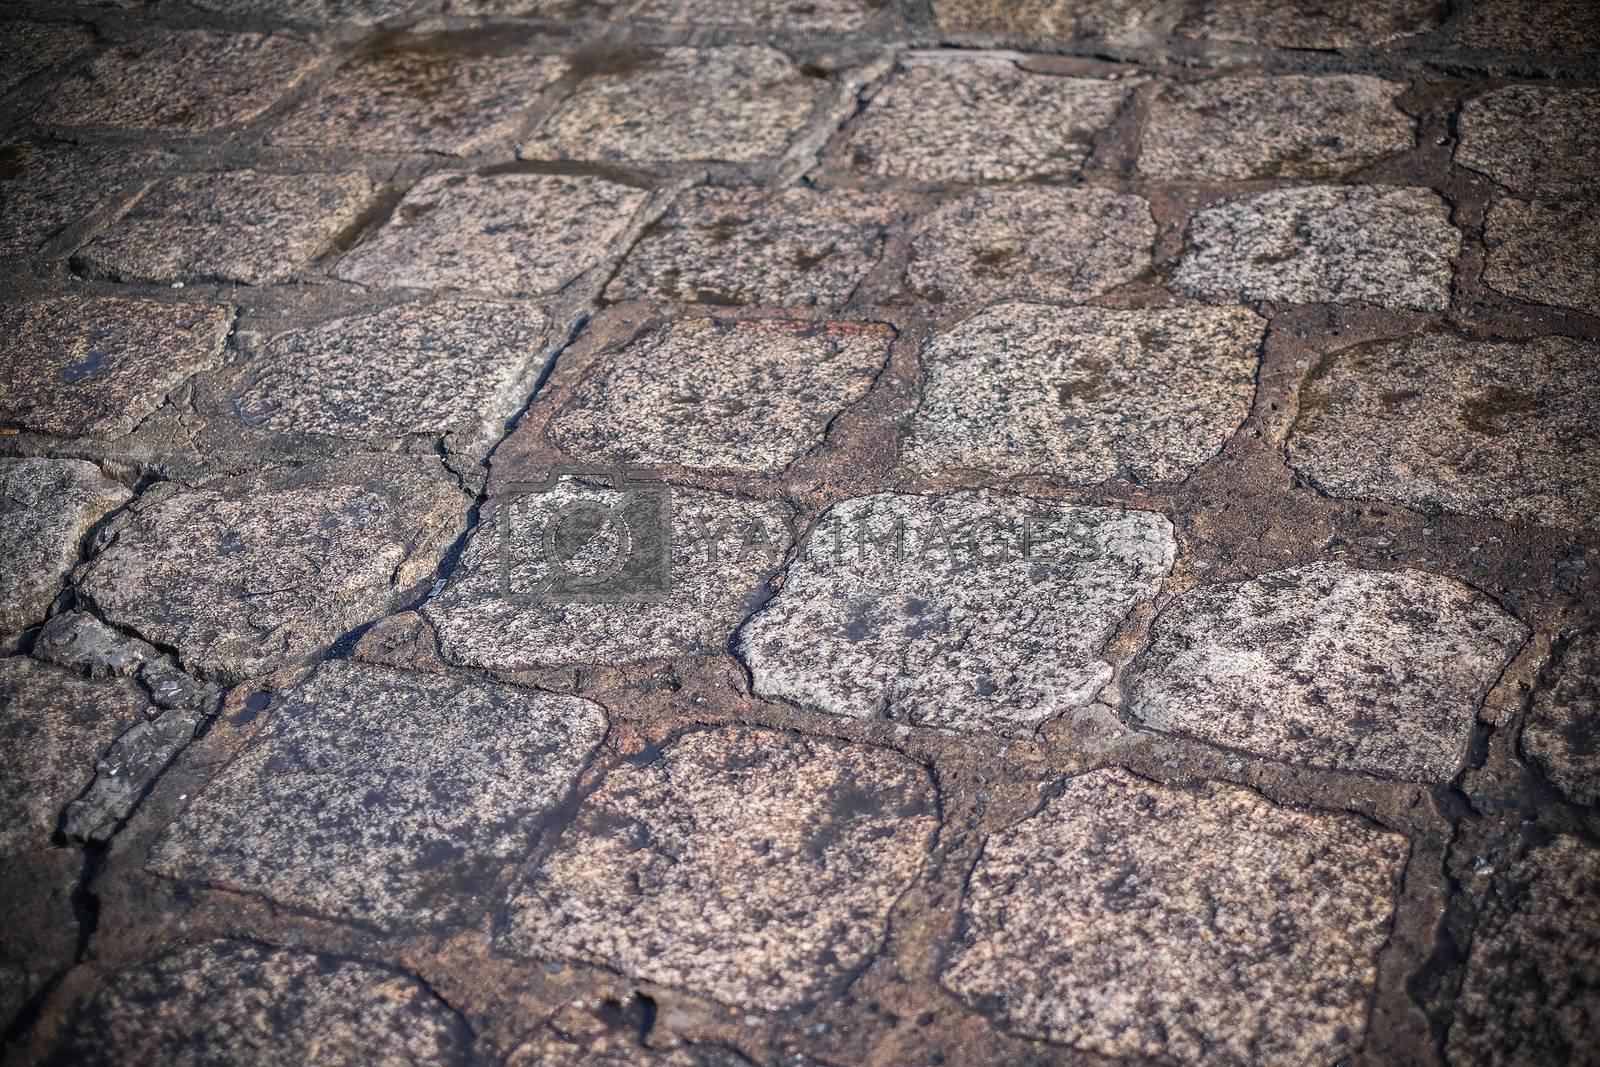 Brick walkway backgroud and close up